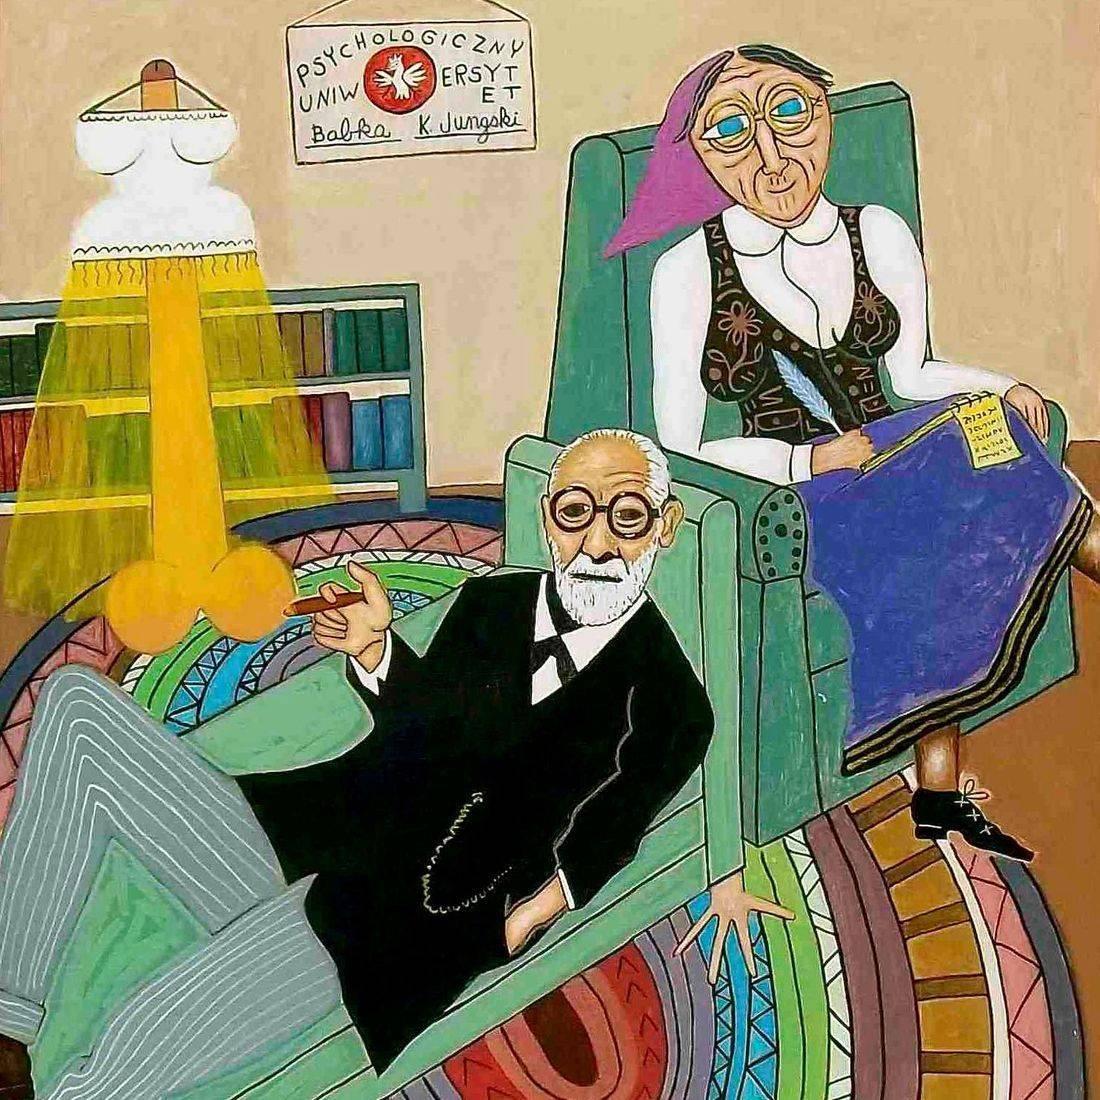 Sigmund Freud, Sometimes a Cigar and Just a Cigar, Kielbasa, Grandmother, Psychotherapist, Psychiatrist, Counselor, Freudian Slip, Sexual Imagery, Braided Rug, Cat, Phalic Symbol